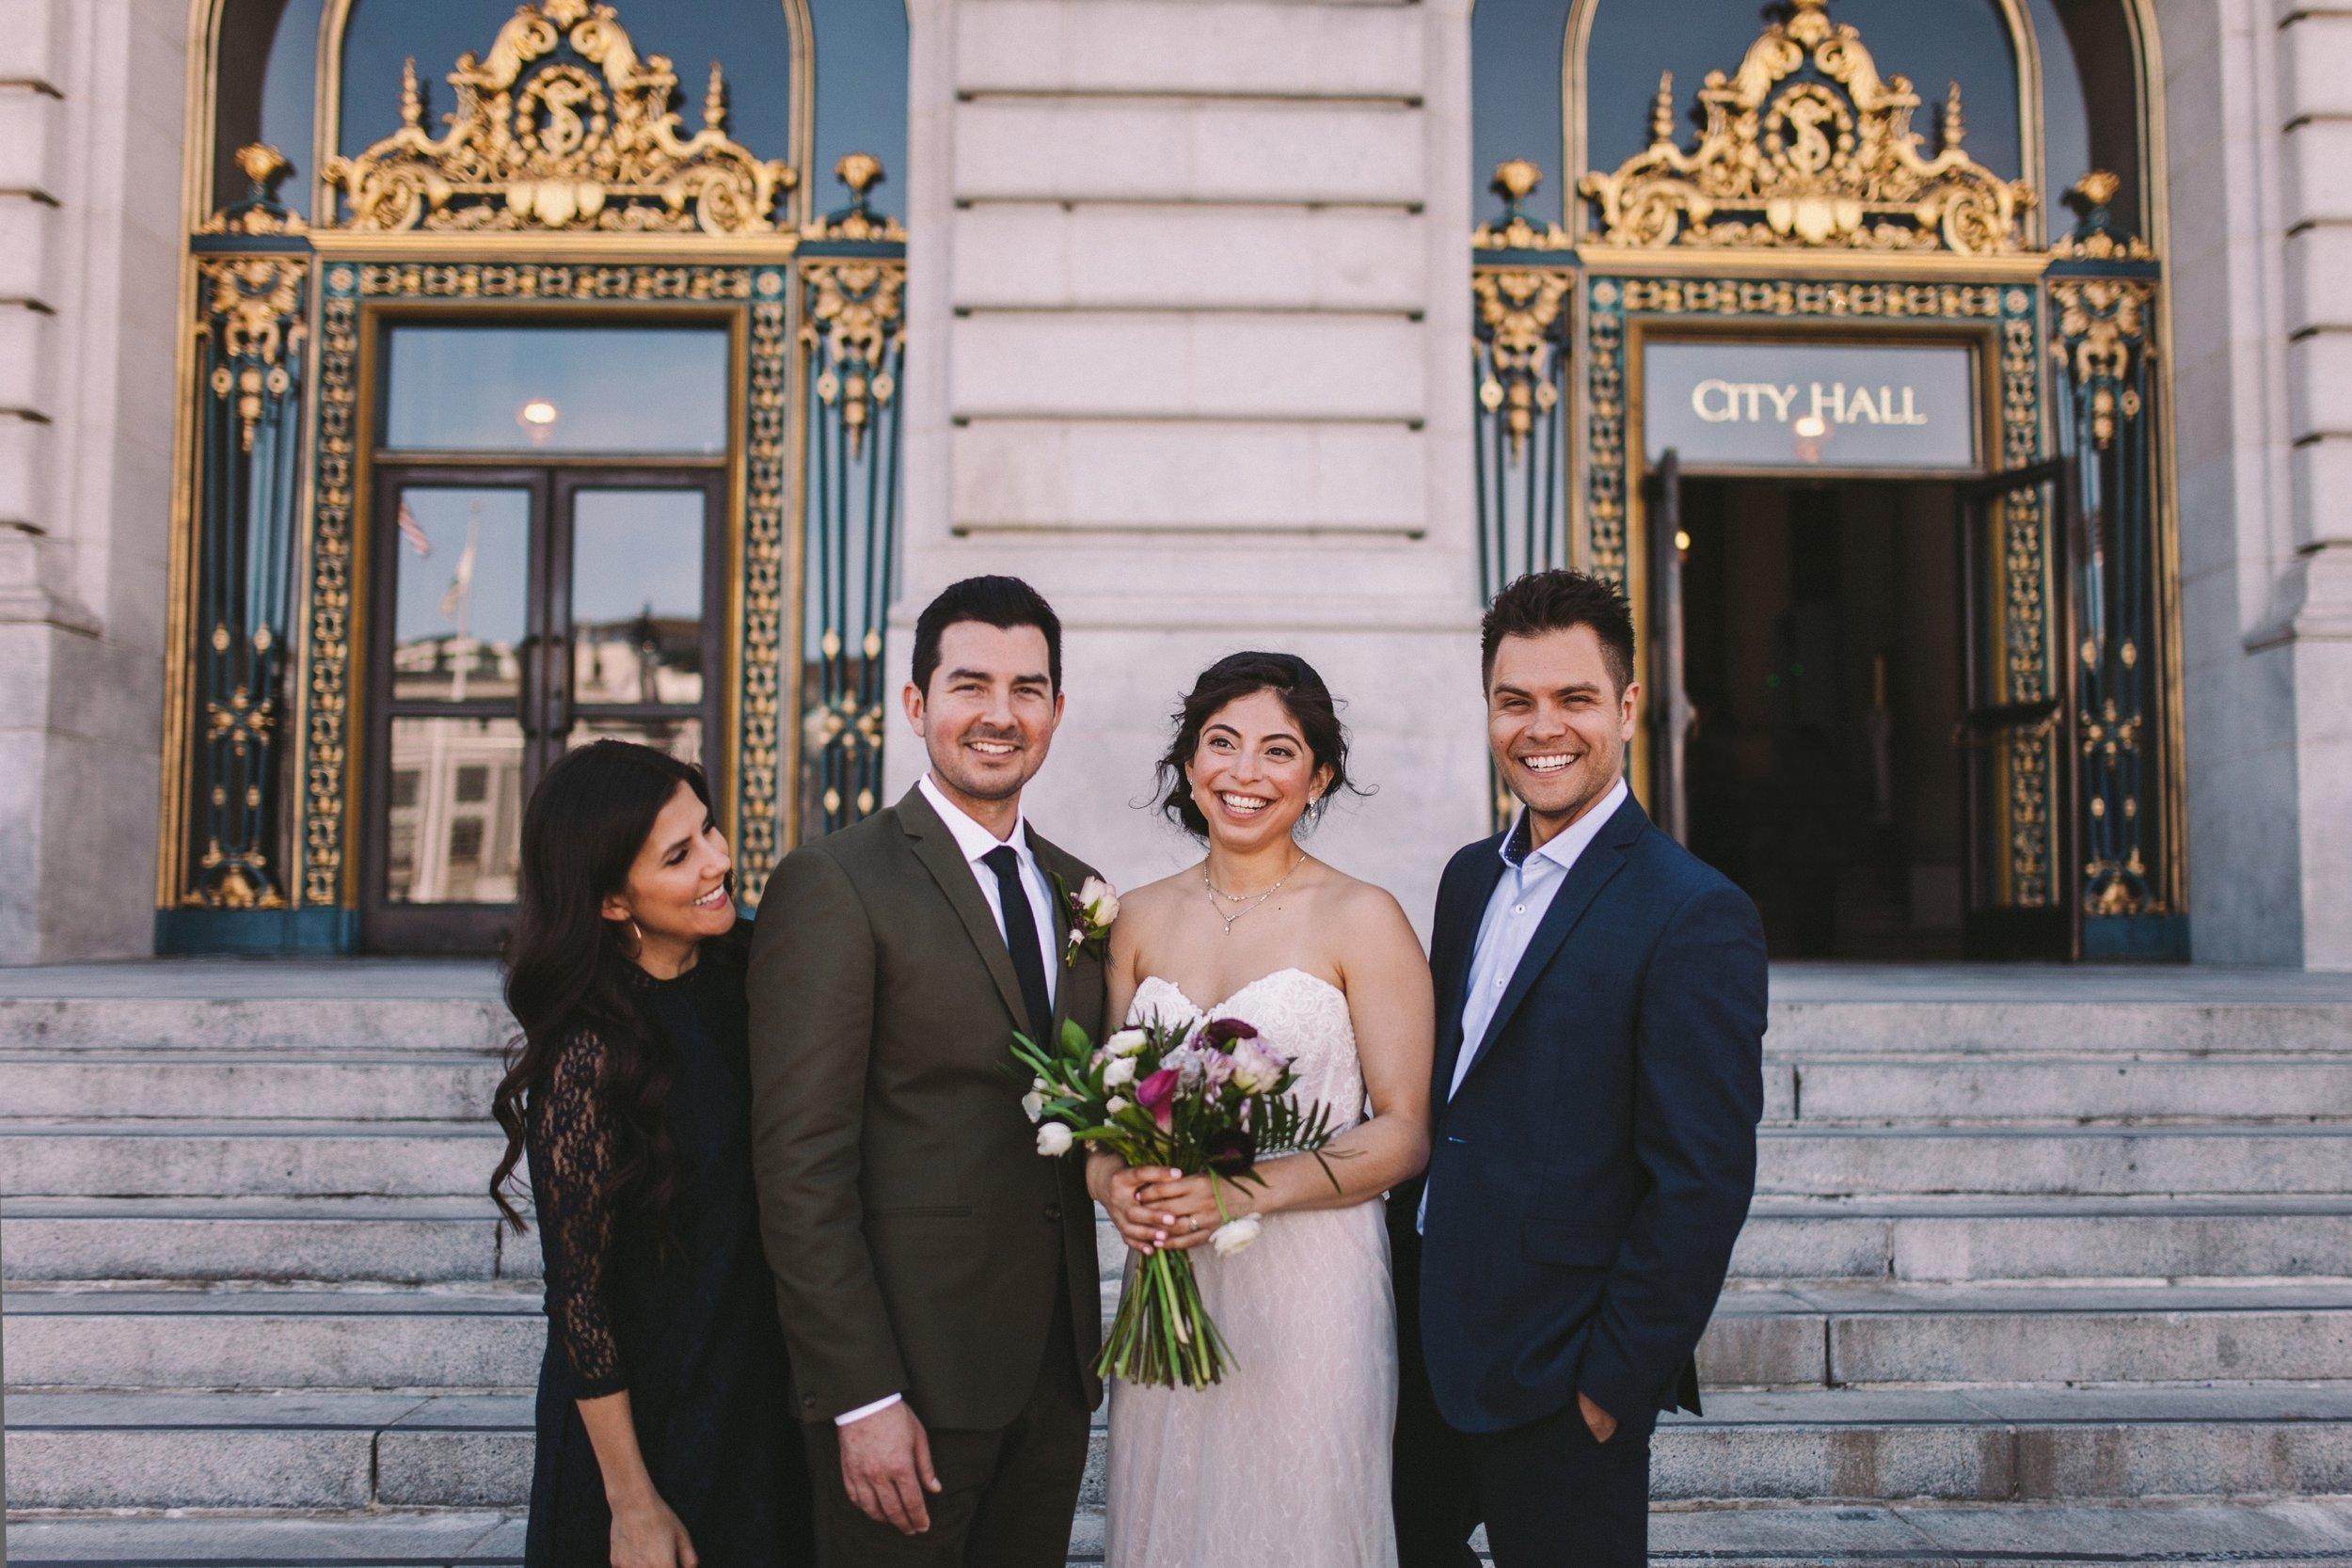 San Francisco City Hall & Stable Cafe Wedding Photography 322.jpg